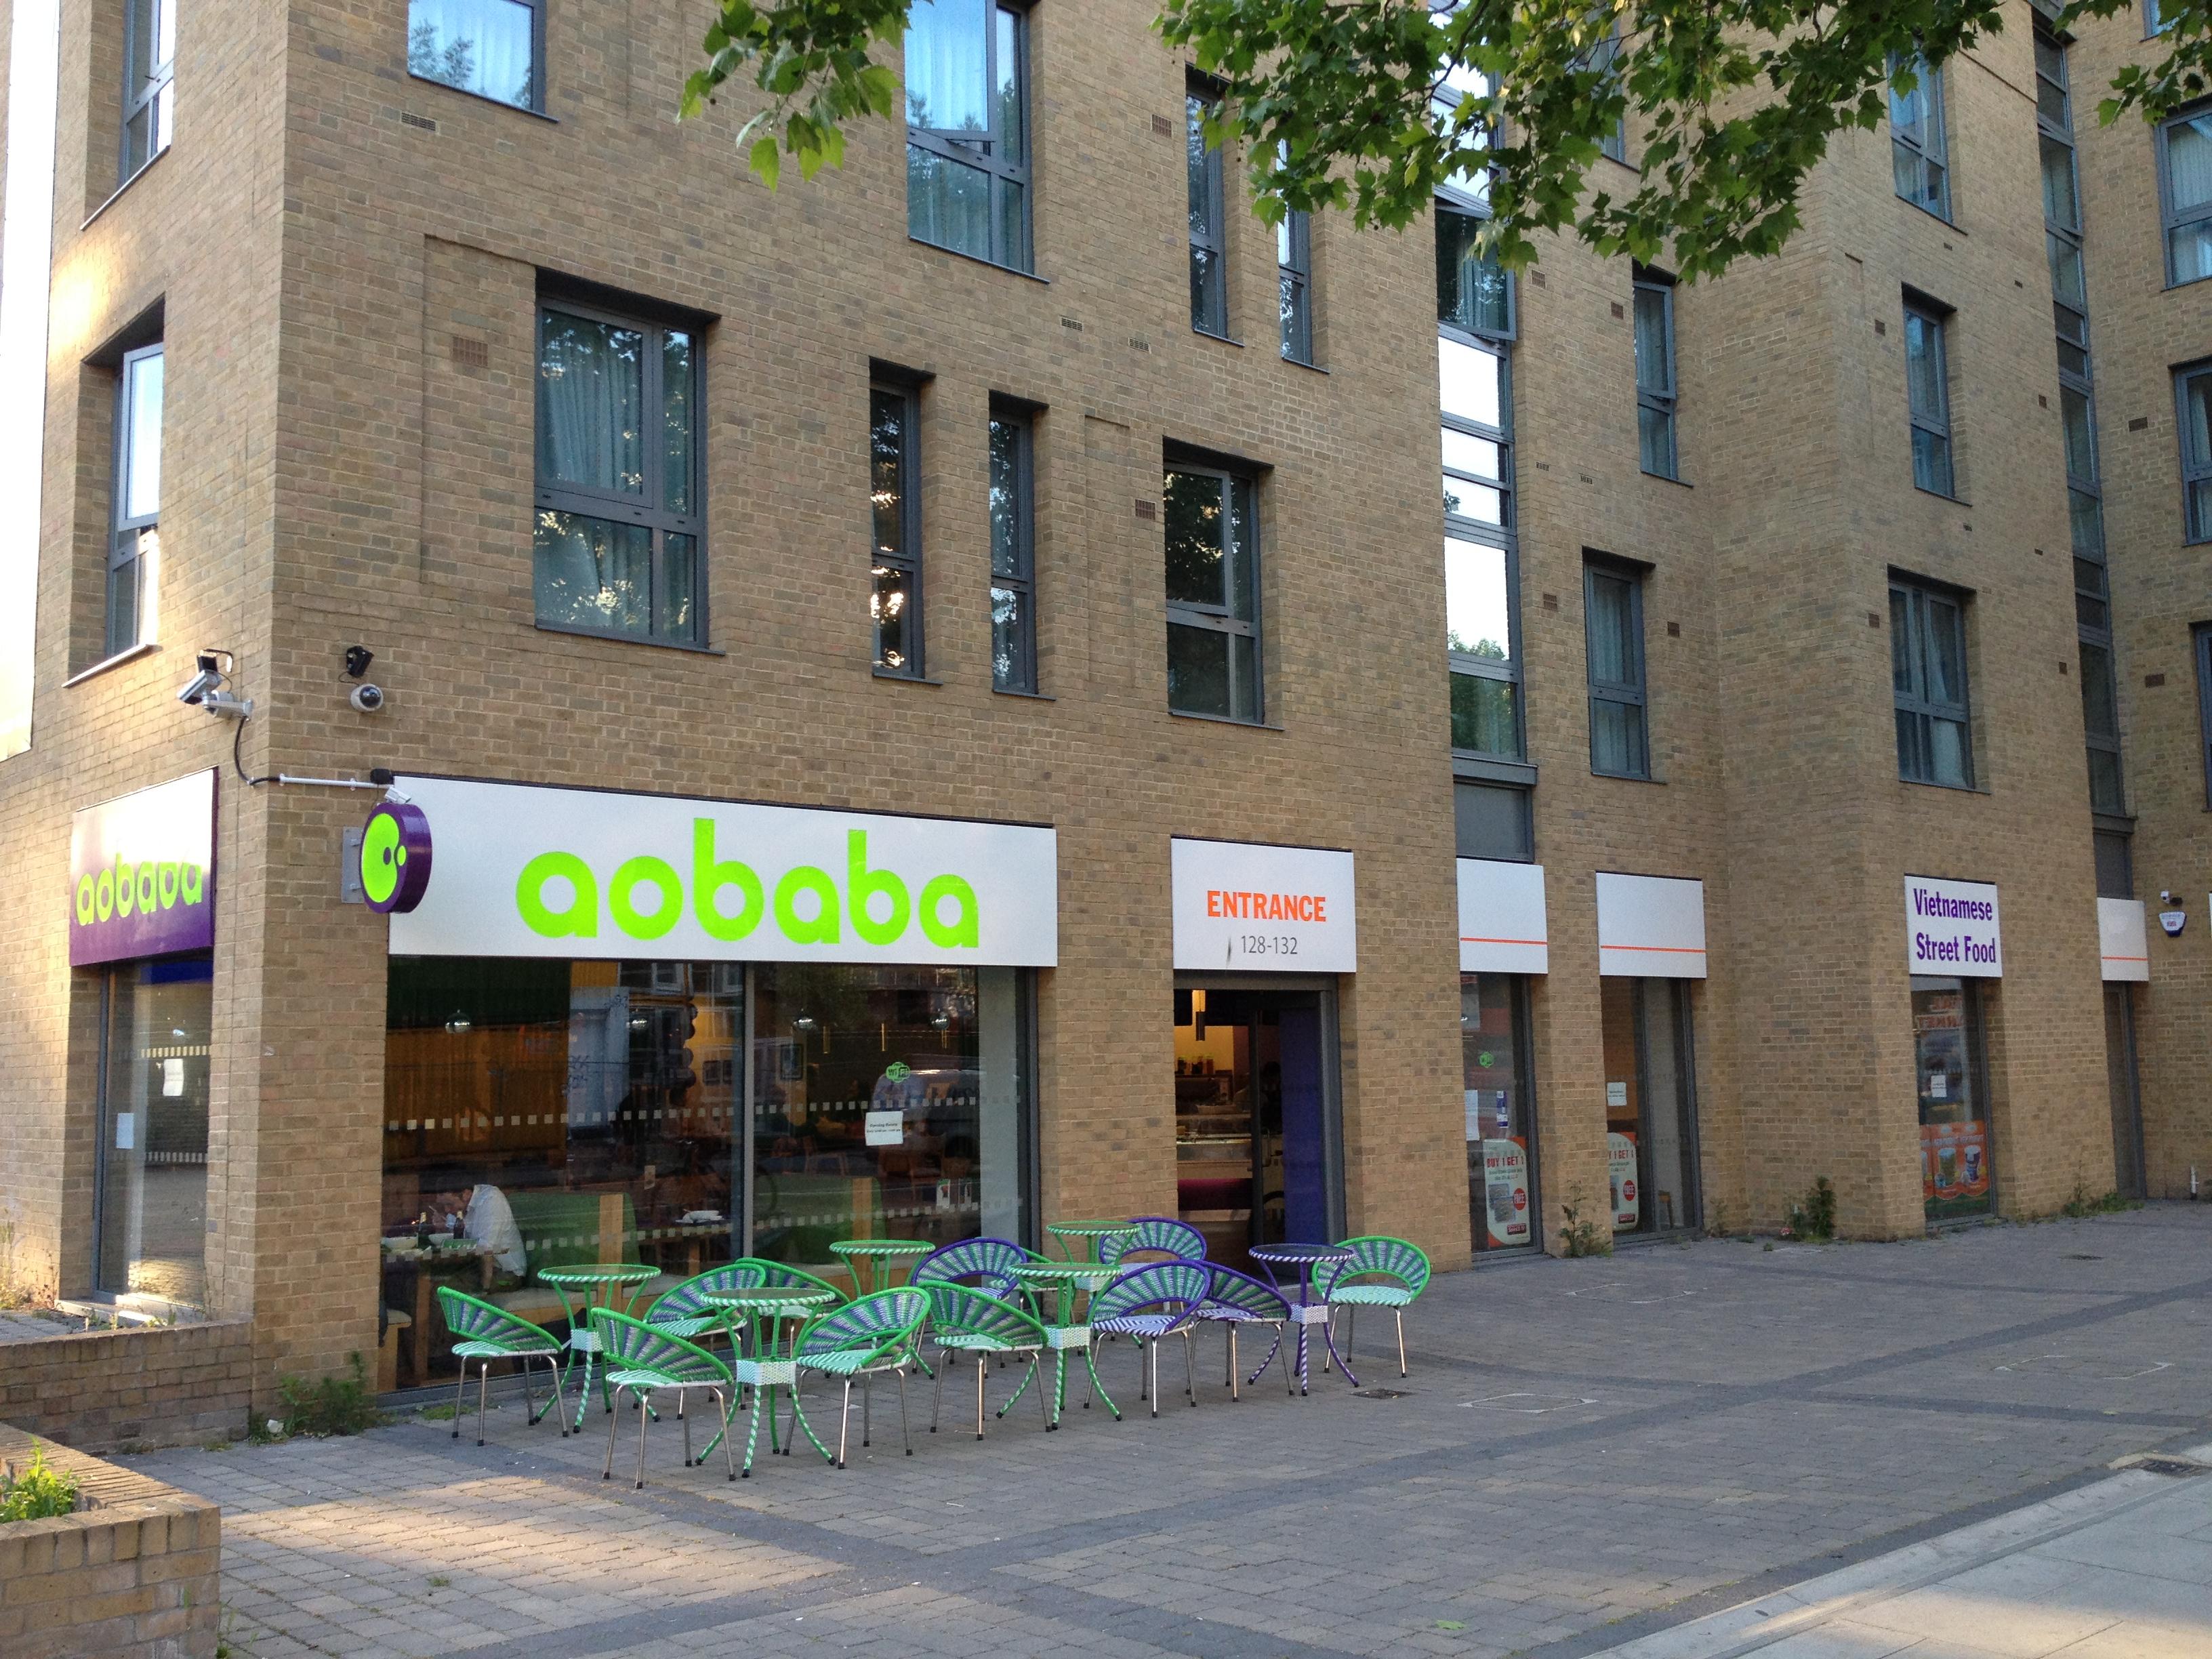 Aobaba - kenningtonrunoff.com